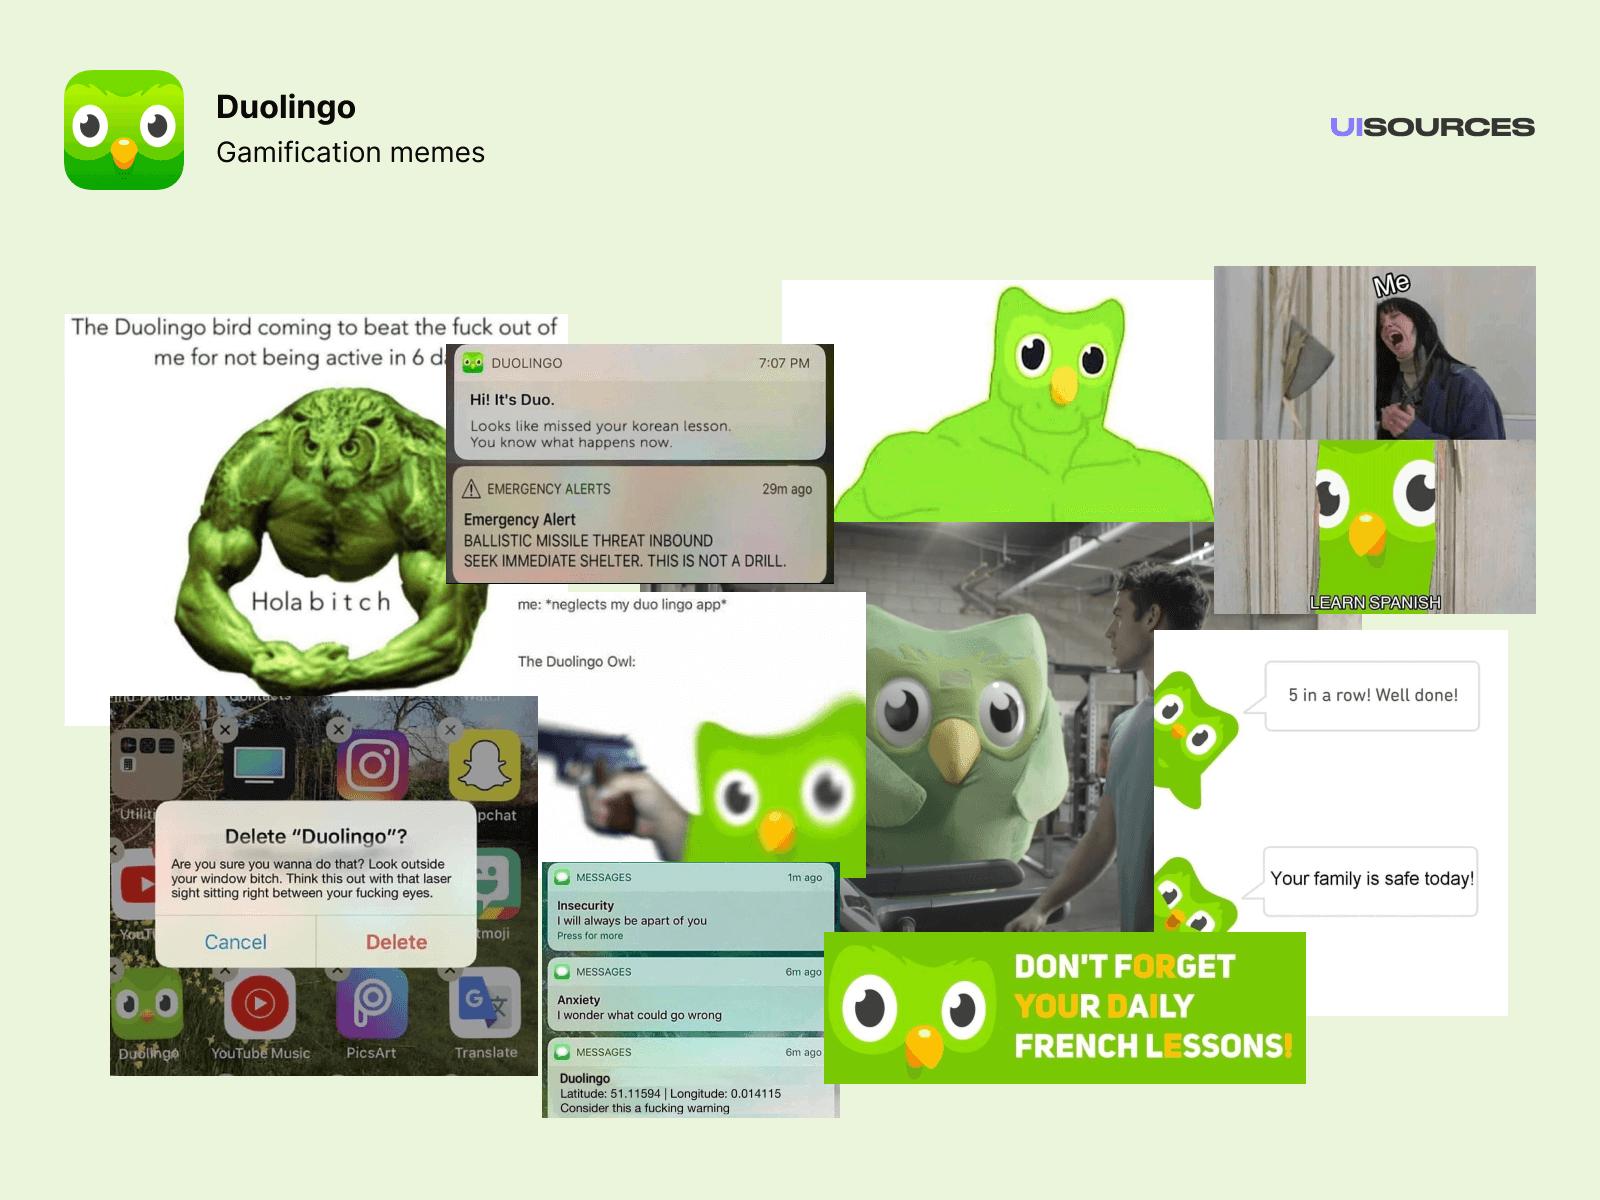 Gamification memes